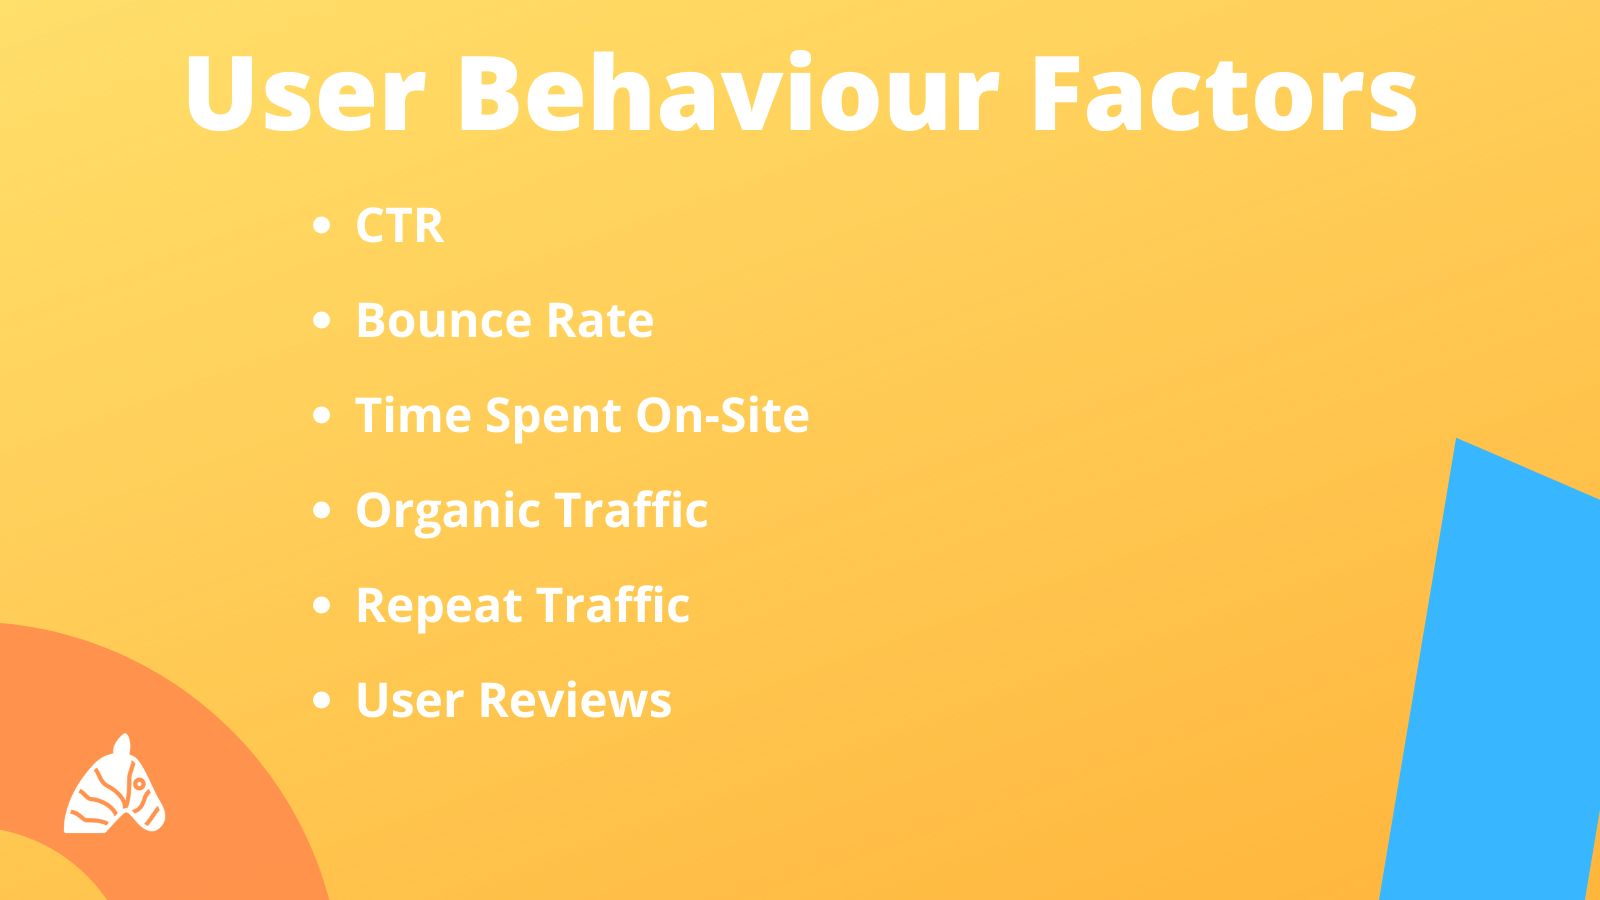 user behaviour factors in the search ranking algorithm